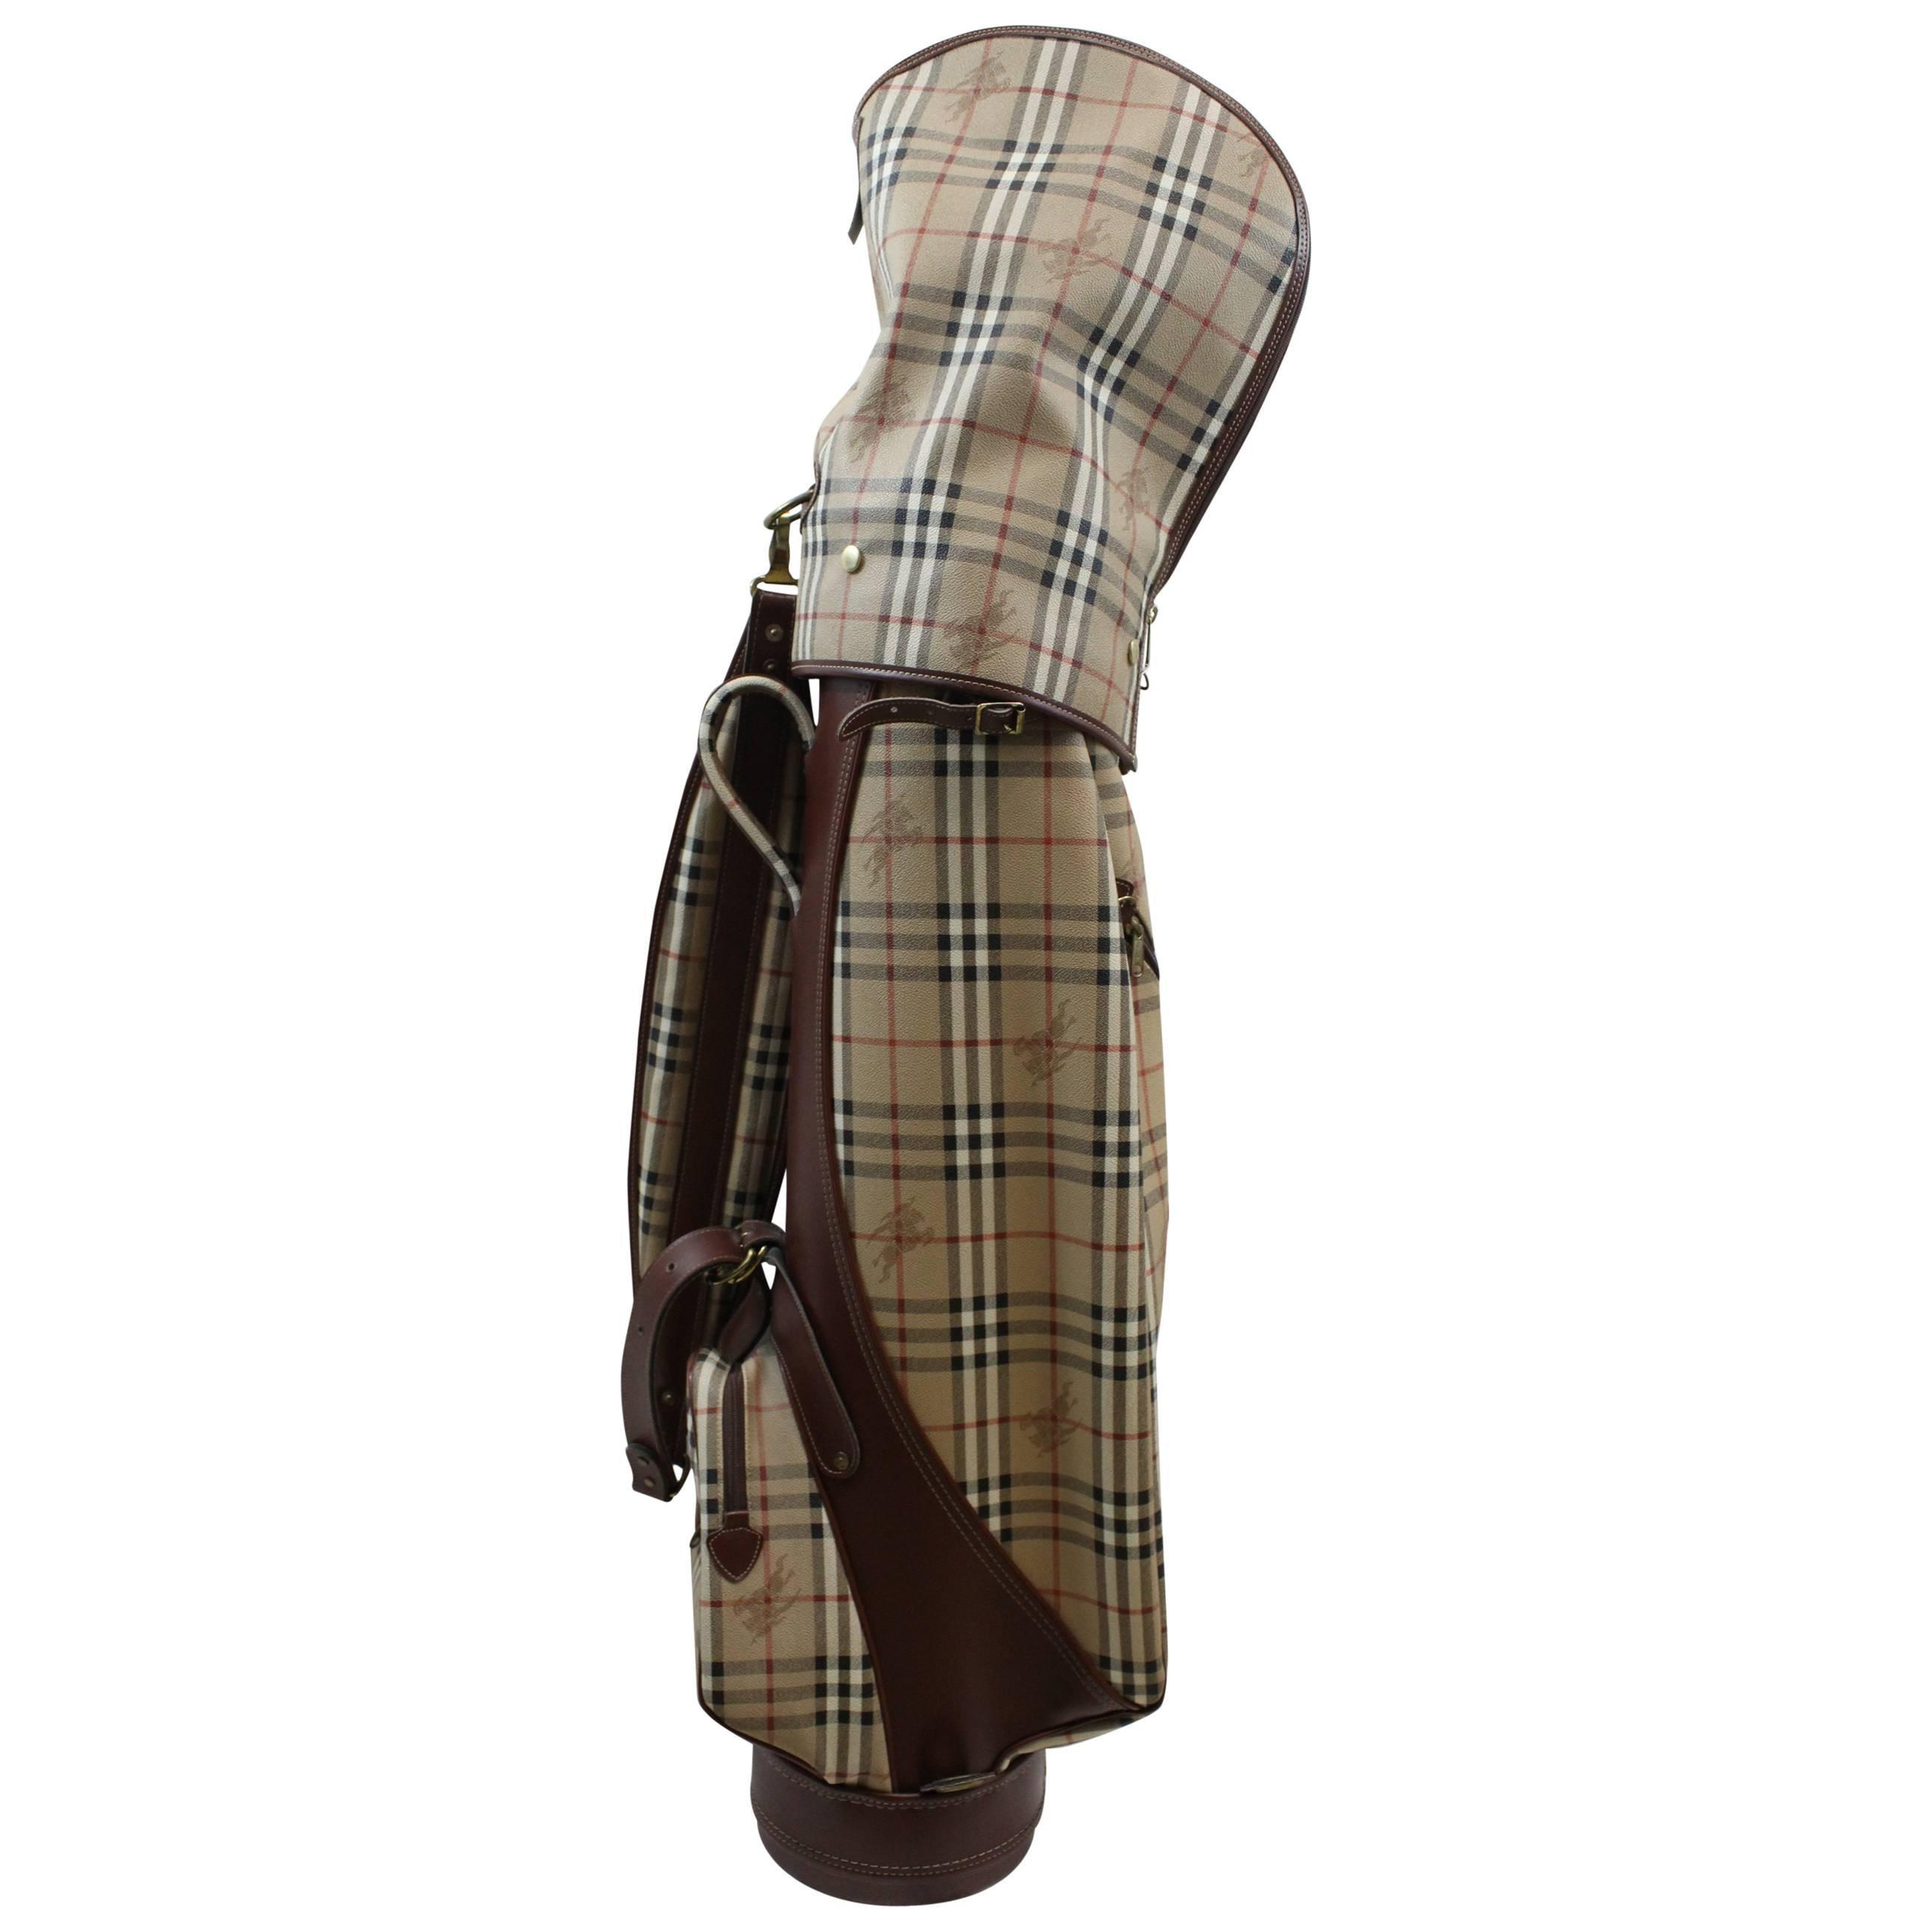 029cdf89989f Vintage Burberry Check Pattern Golf Bag at 1stdibs